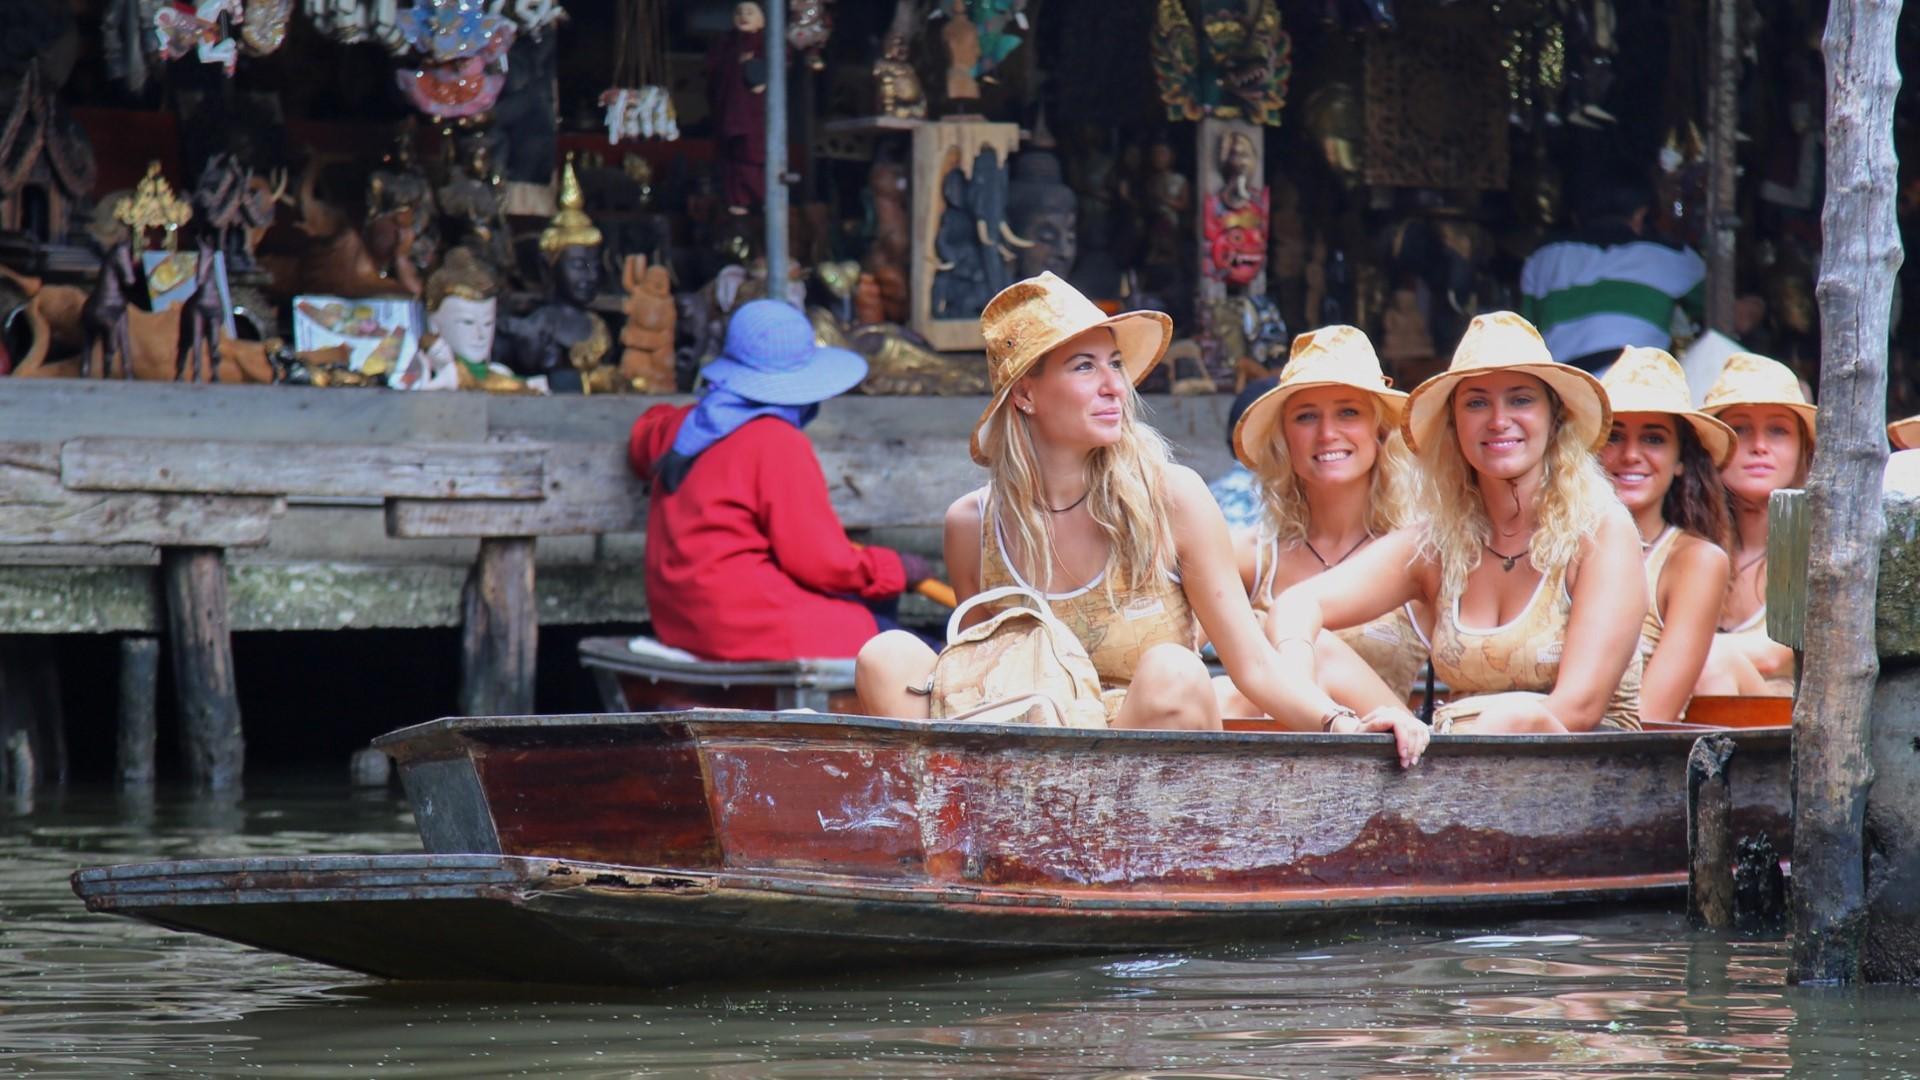 Donnavventura: i mercati galleggianti della Thailandia